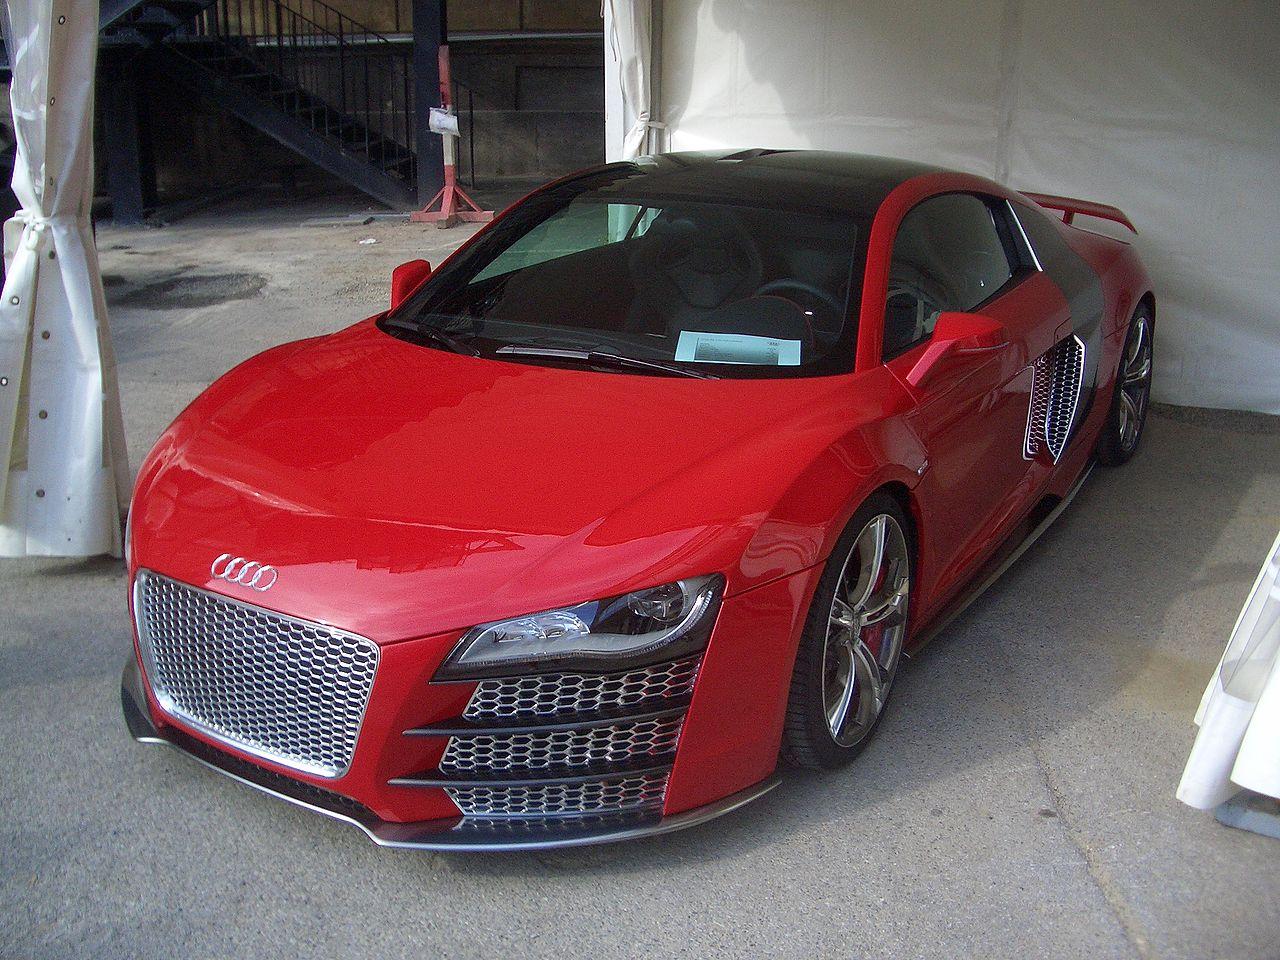 Audi tt coupe price in malaysia 10